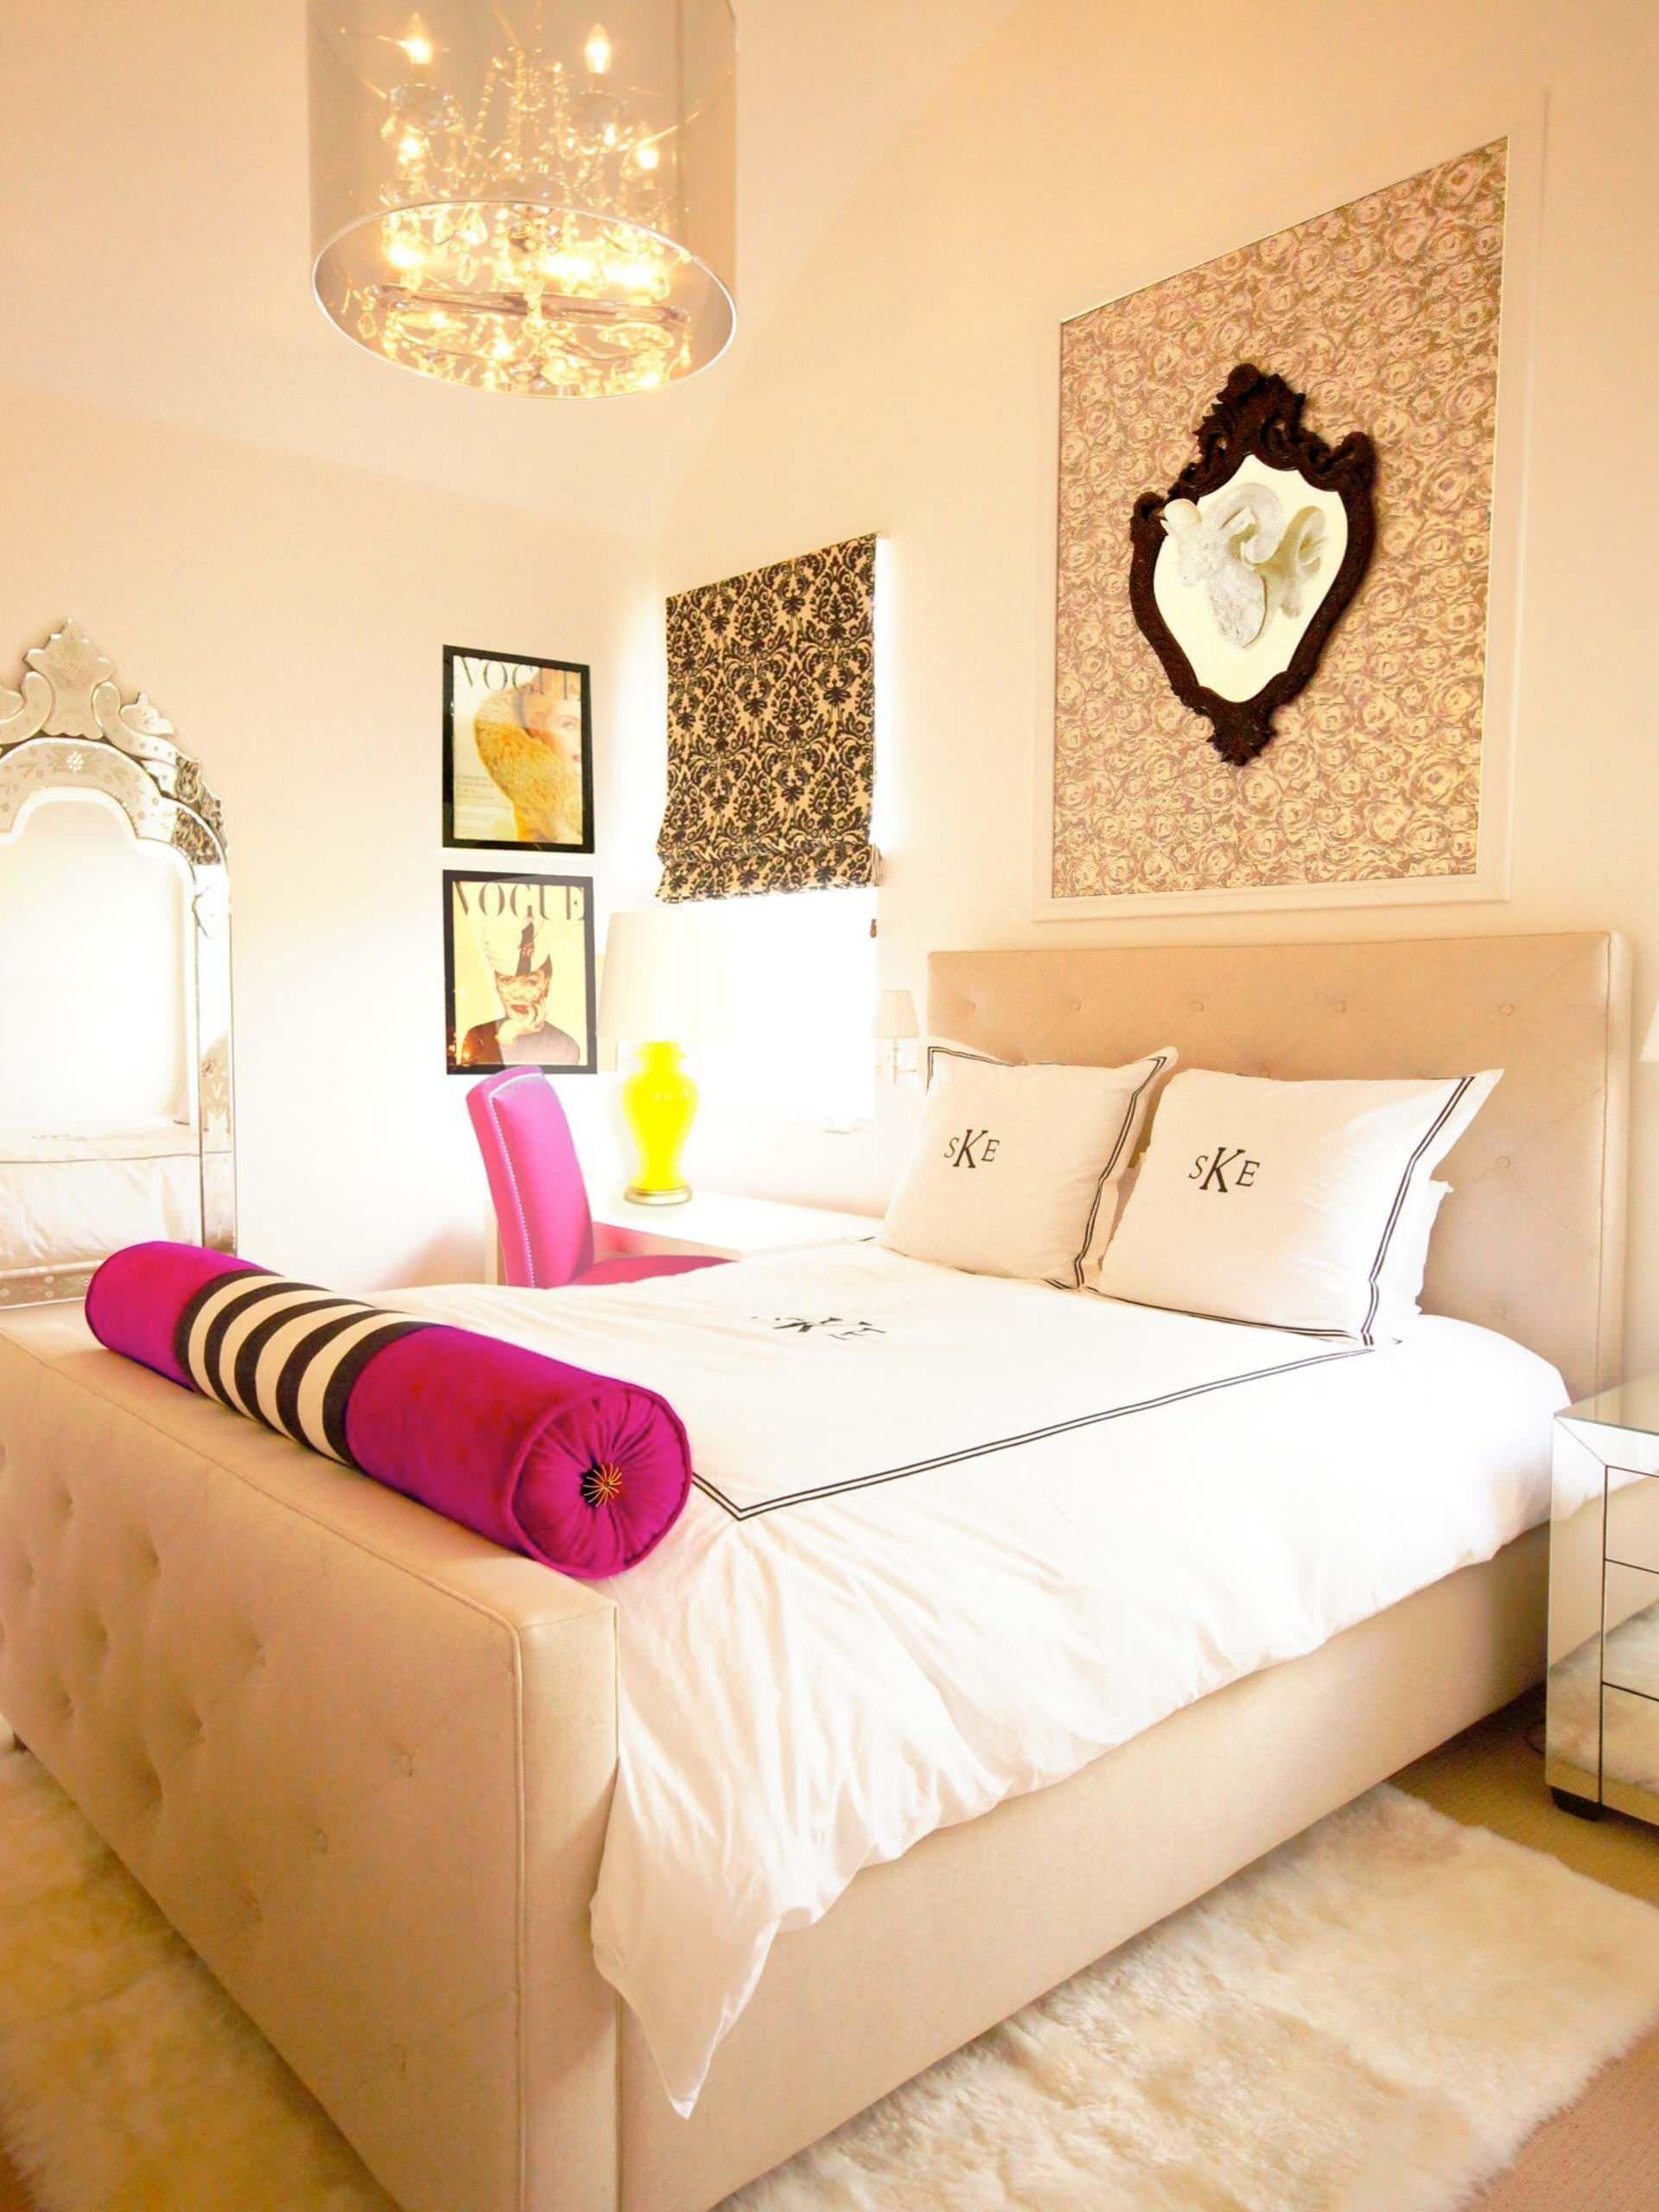 Astonishing Teenage Girl Bedroom Paint Ideas: Furry Area Rugs For ...